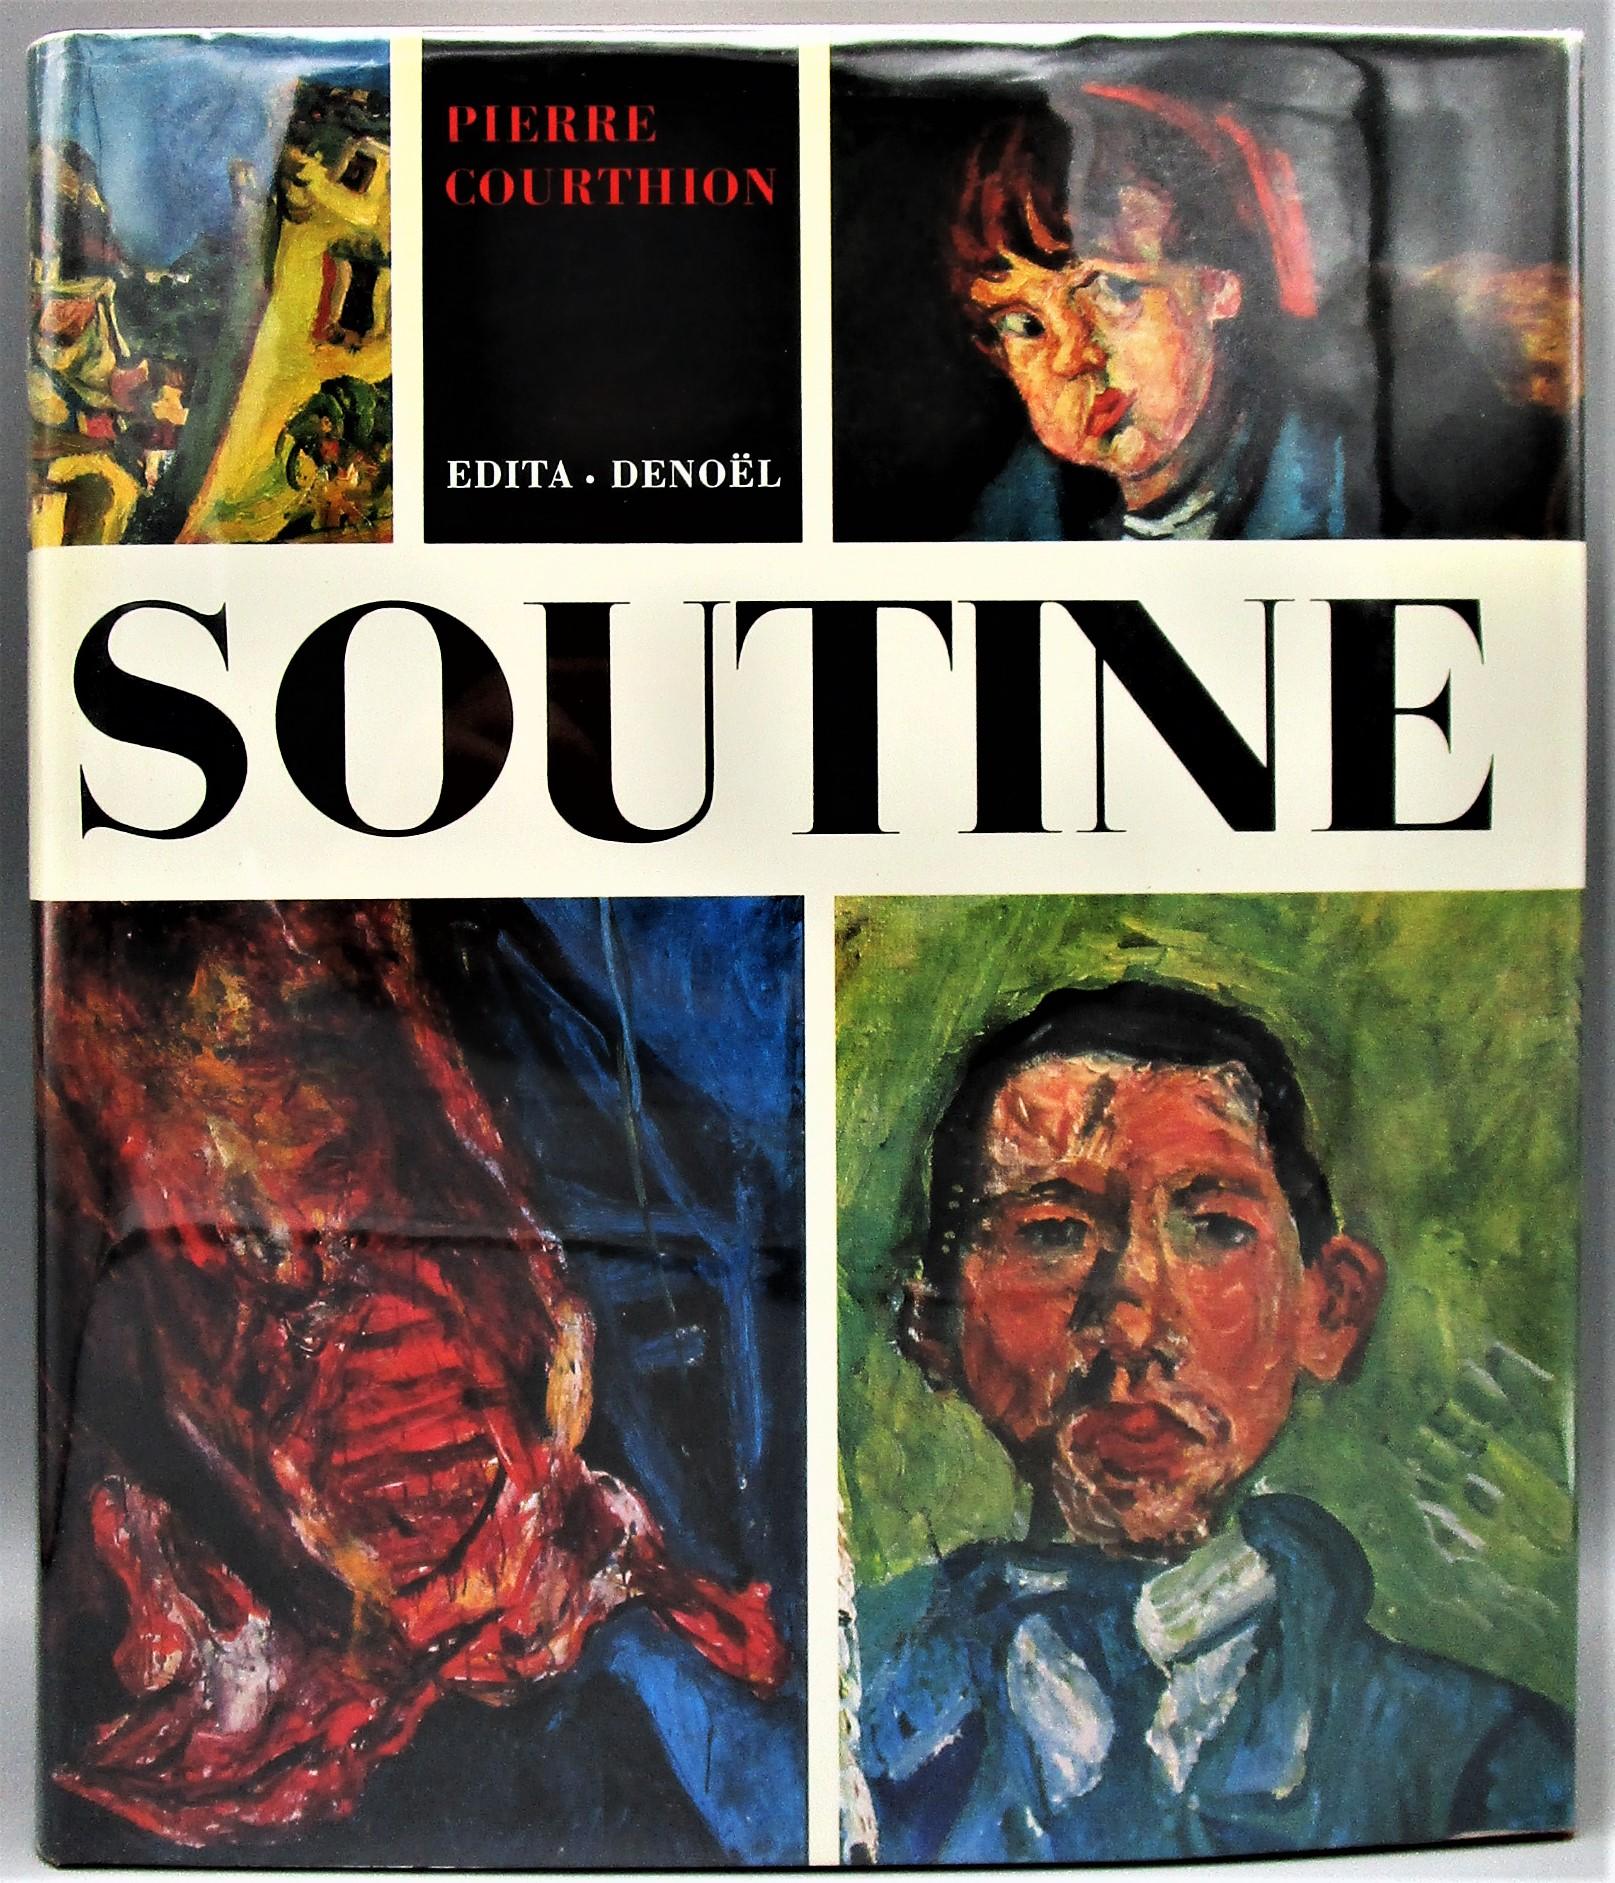 SOUTINE: PEINTRE DU DECHIRANT, by Pierre Courthion - 1972 [1st Ed]